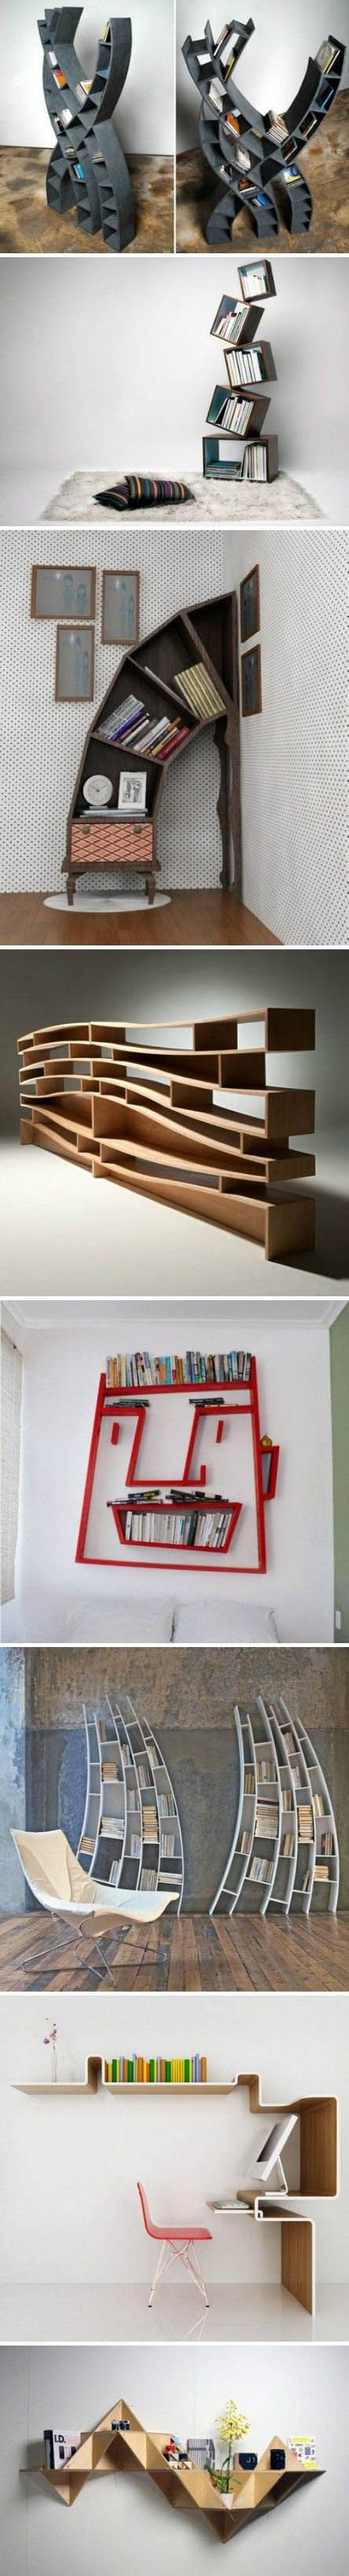 Cool Bookshelf | DIY Crafts Tutorials: | Bibliothèques | Pinterest